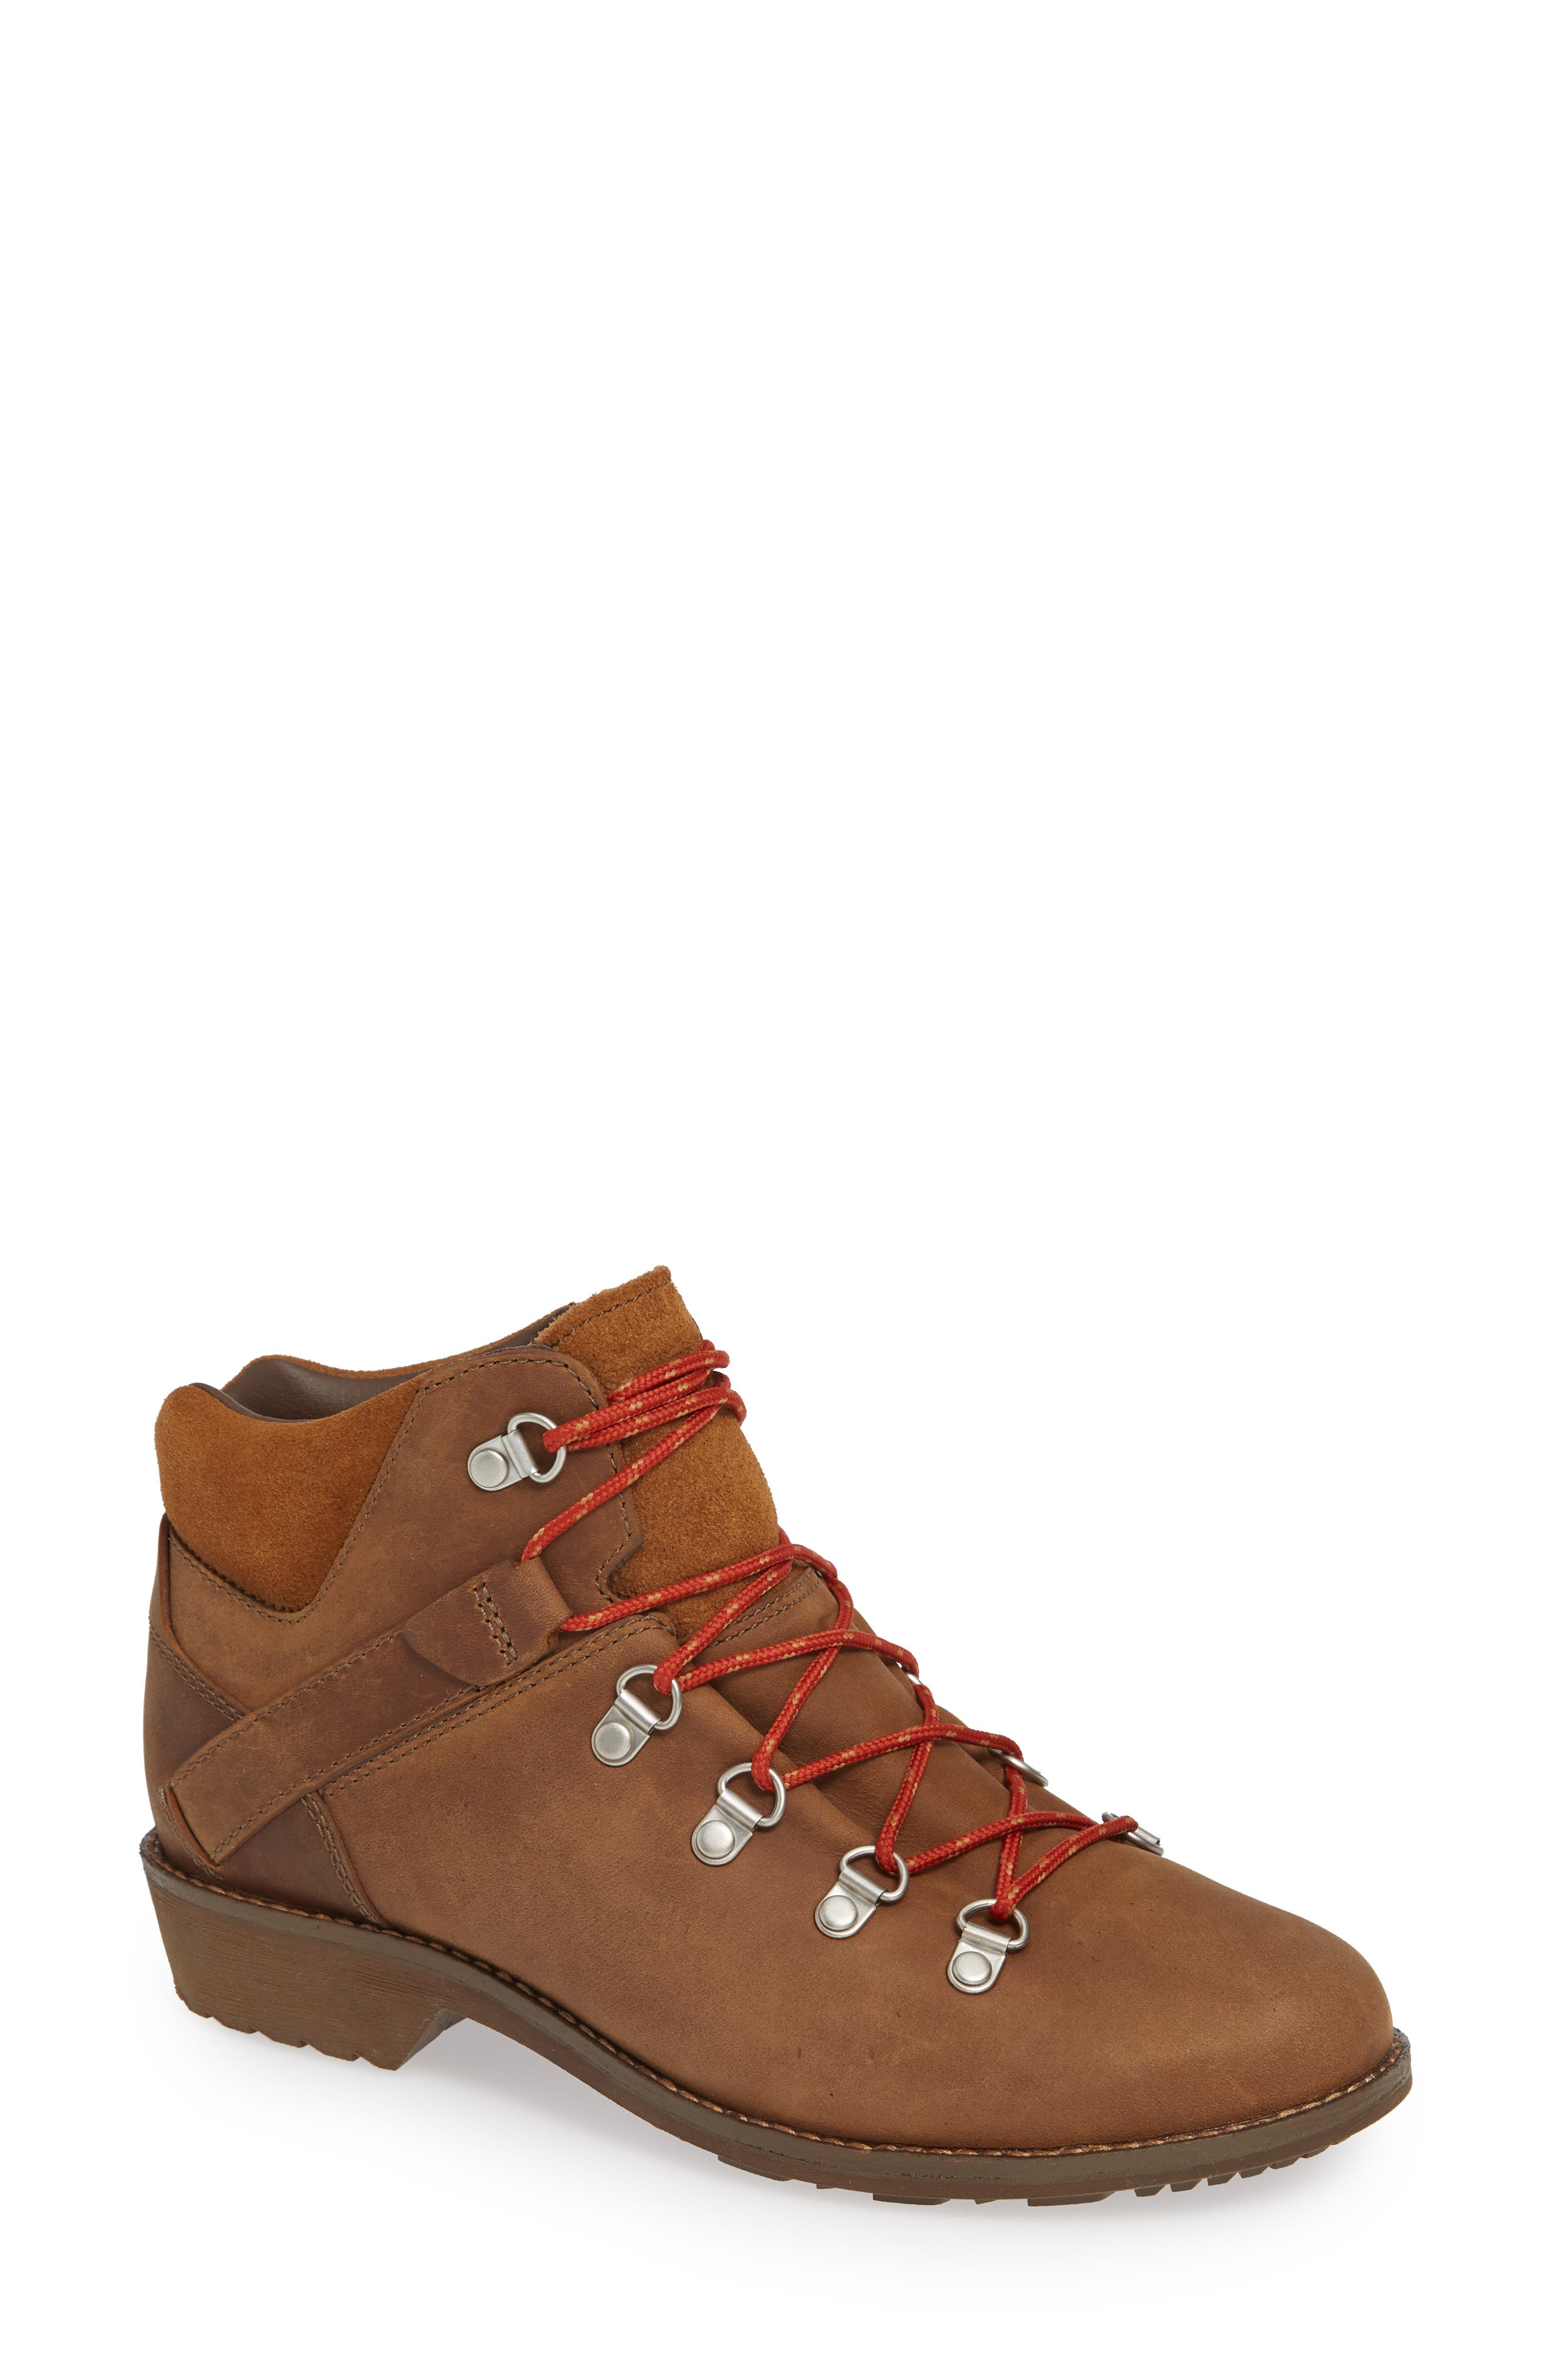 De La Vina Dos Alpine Waterproof Low Boot,                         Main,                         color, PECAN LEATHER